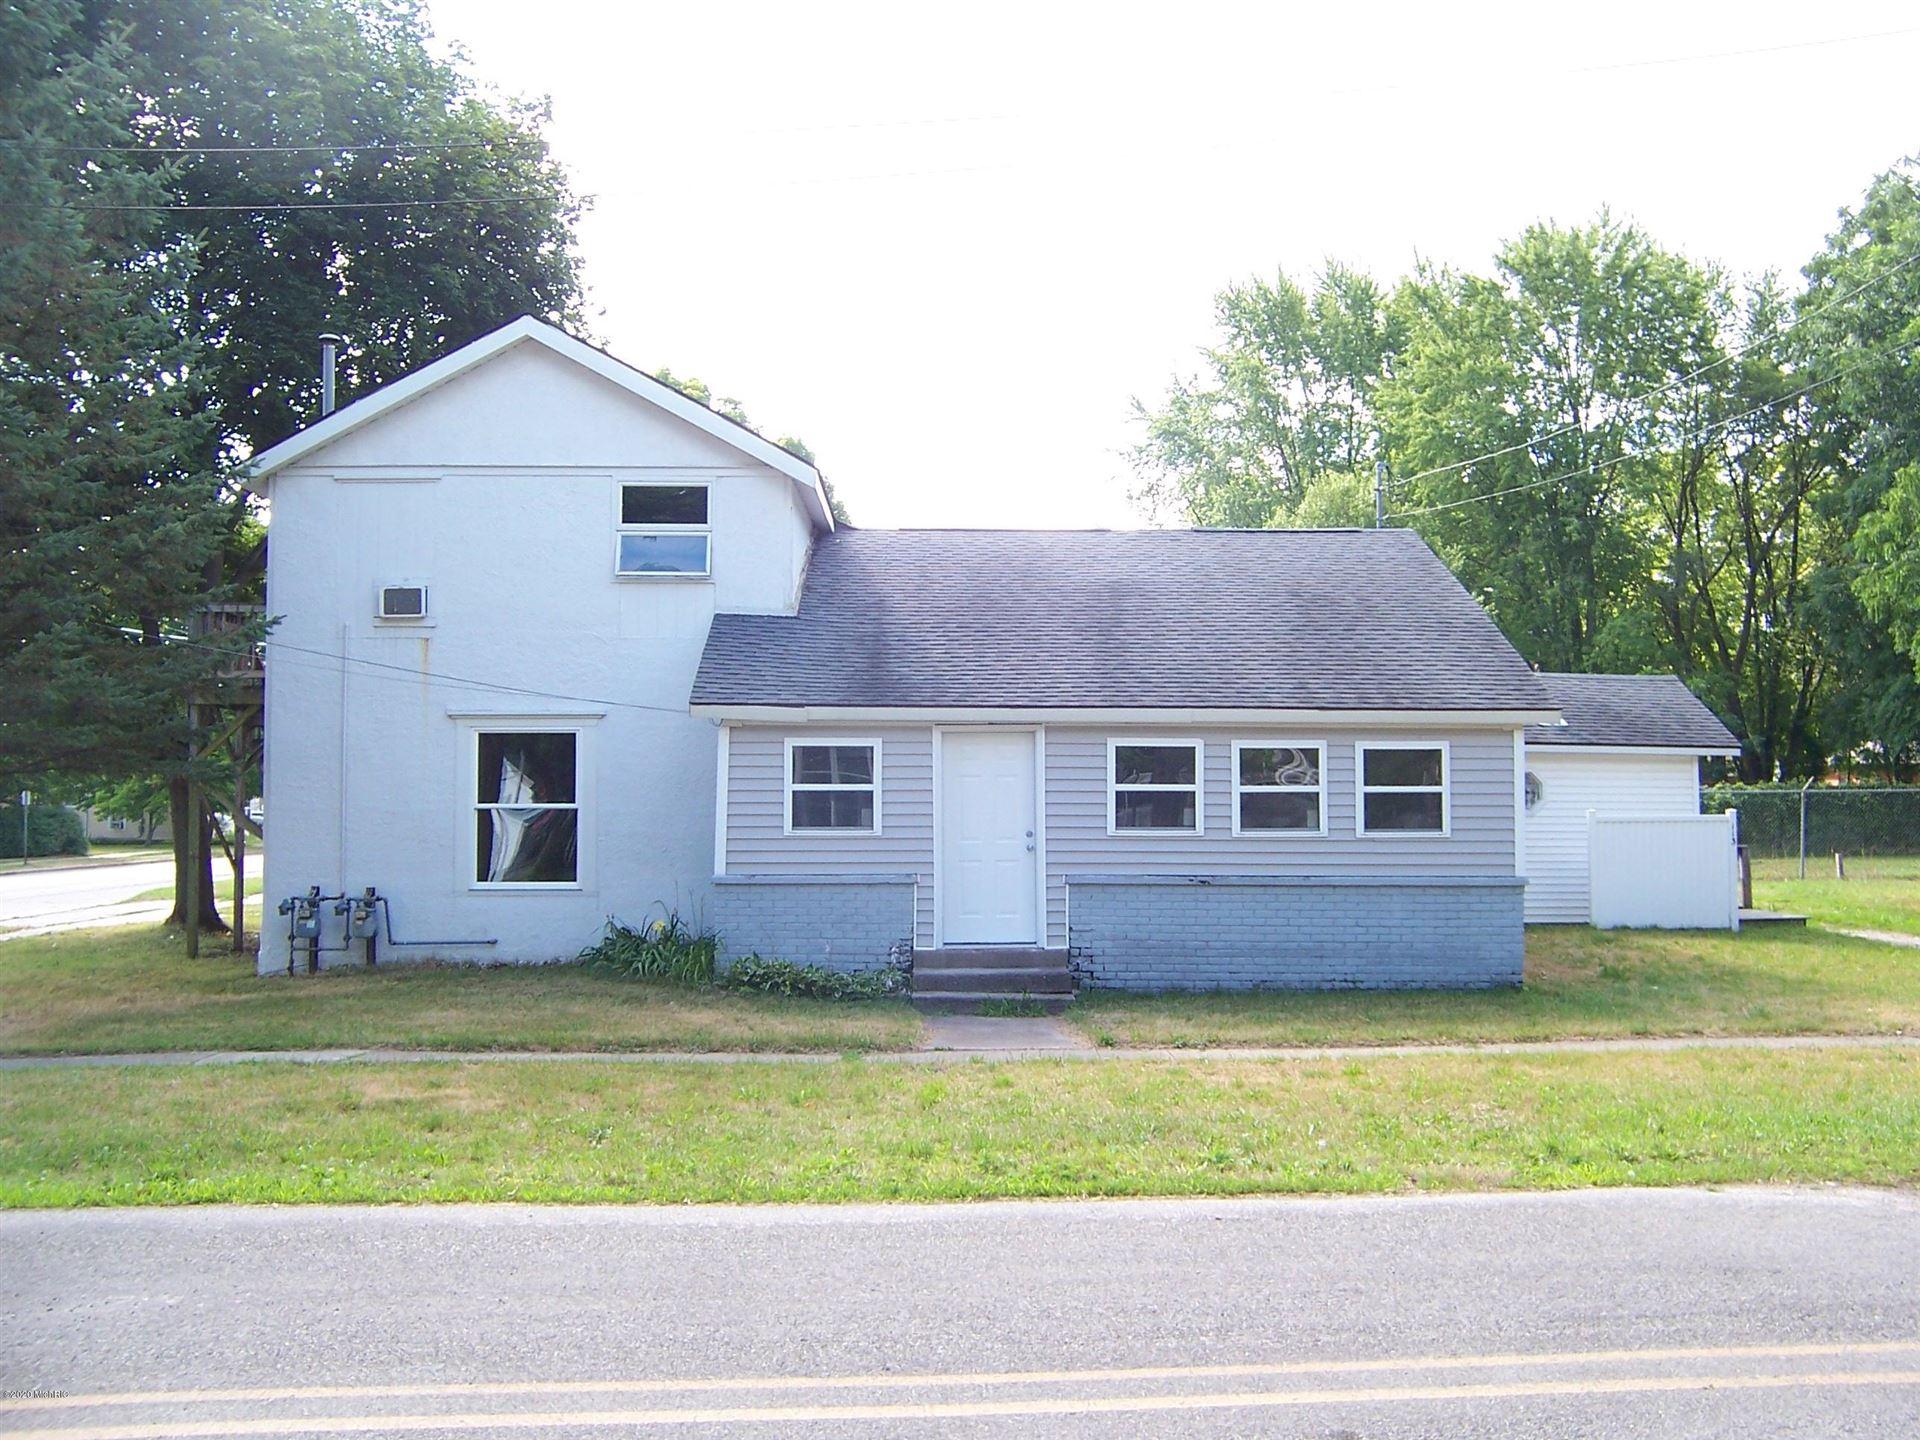 113 second Street, Lakeview, MI 48850 - MLS#: 20029114